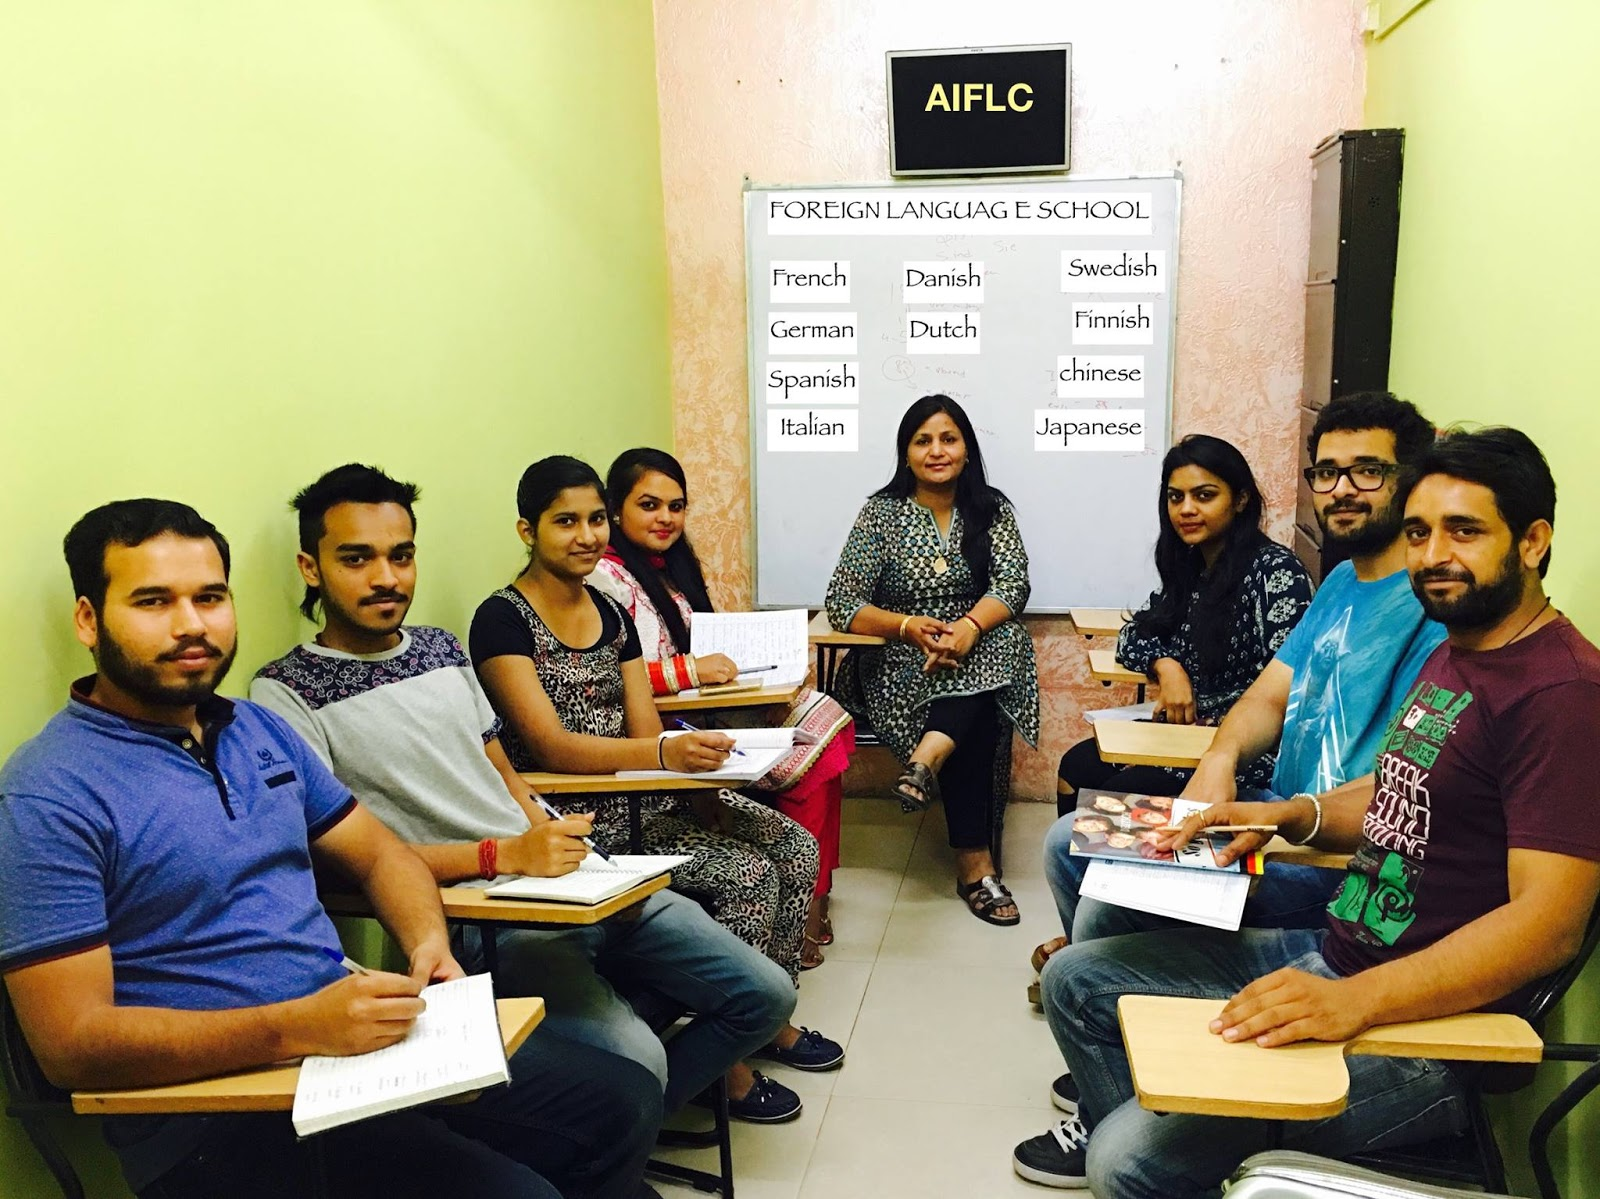 study visa,tourist visa,immigration,foreign language classes